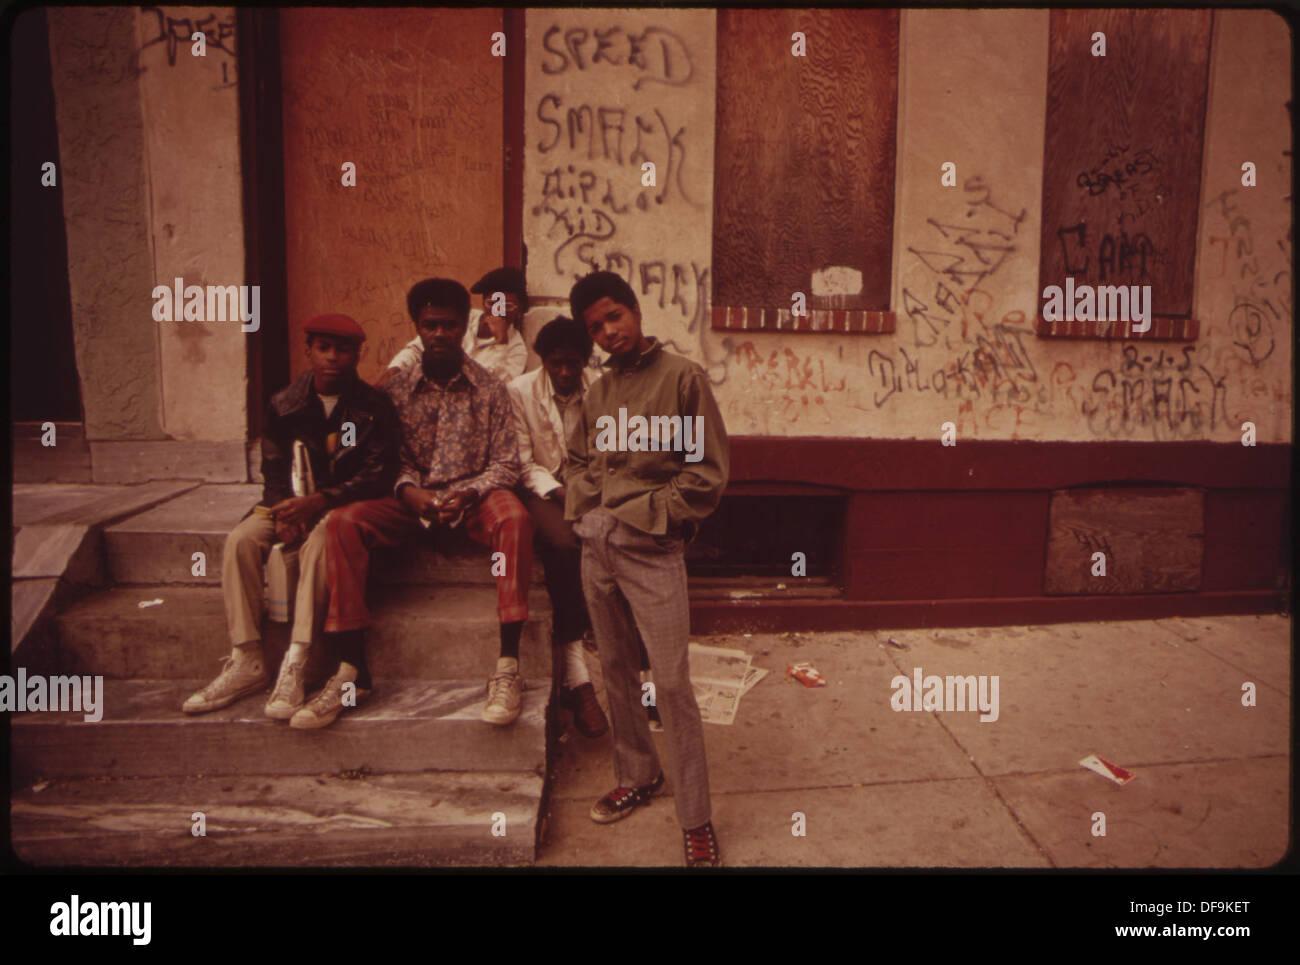 STREET GANG MEMBERS 552753 - Stock Image